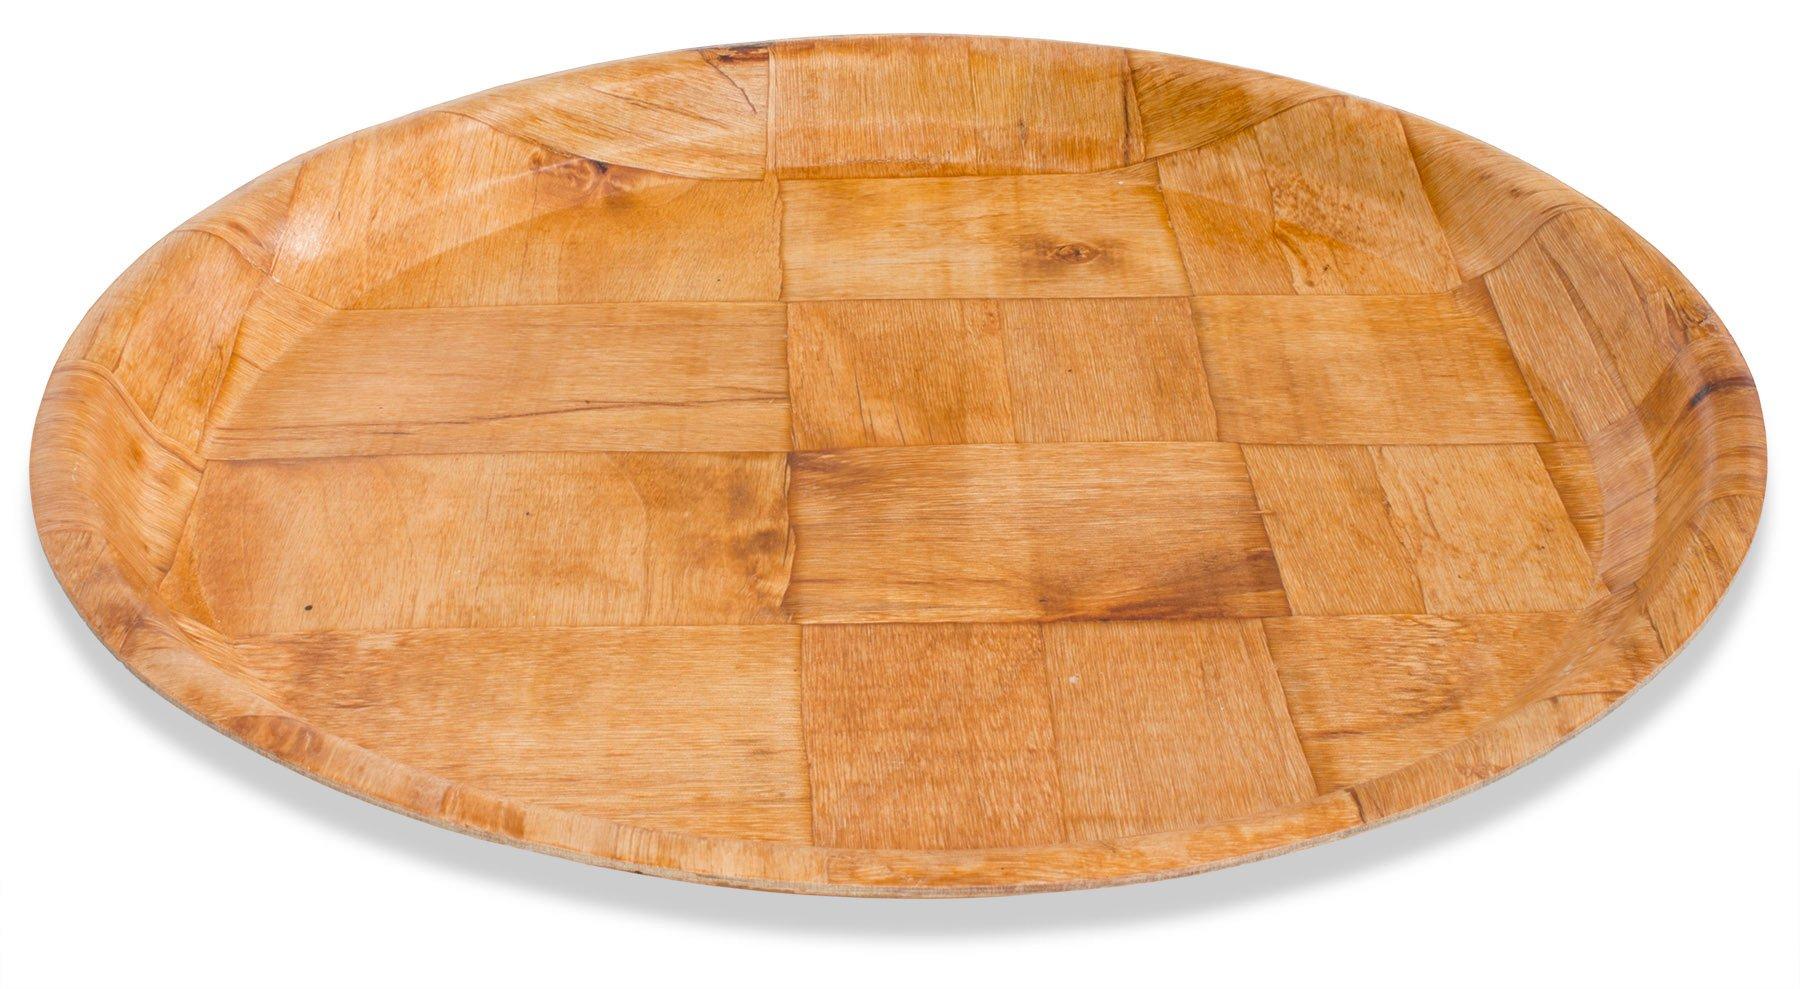 Crestware CWPR13 Woven Wood Round Tray, 13'', Brown